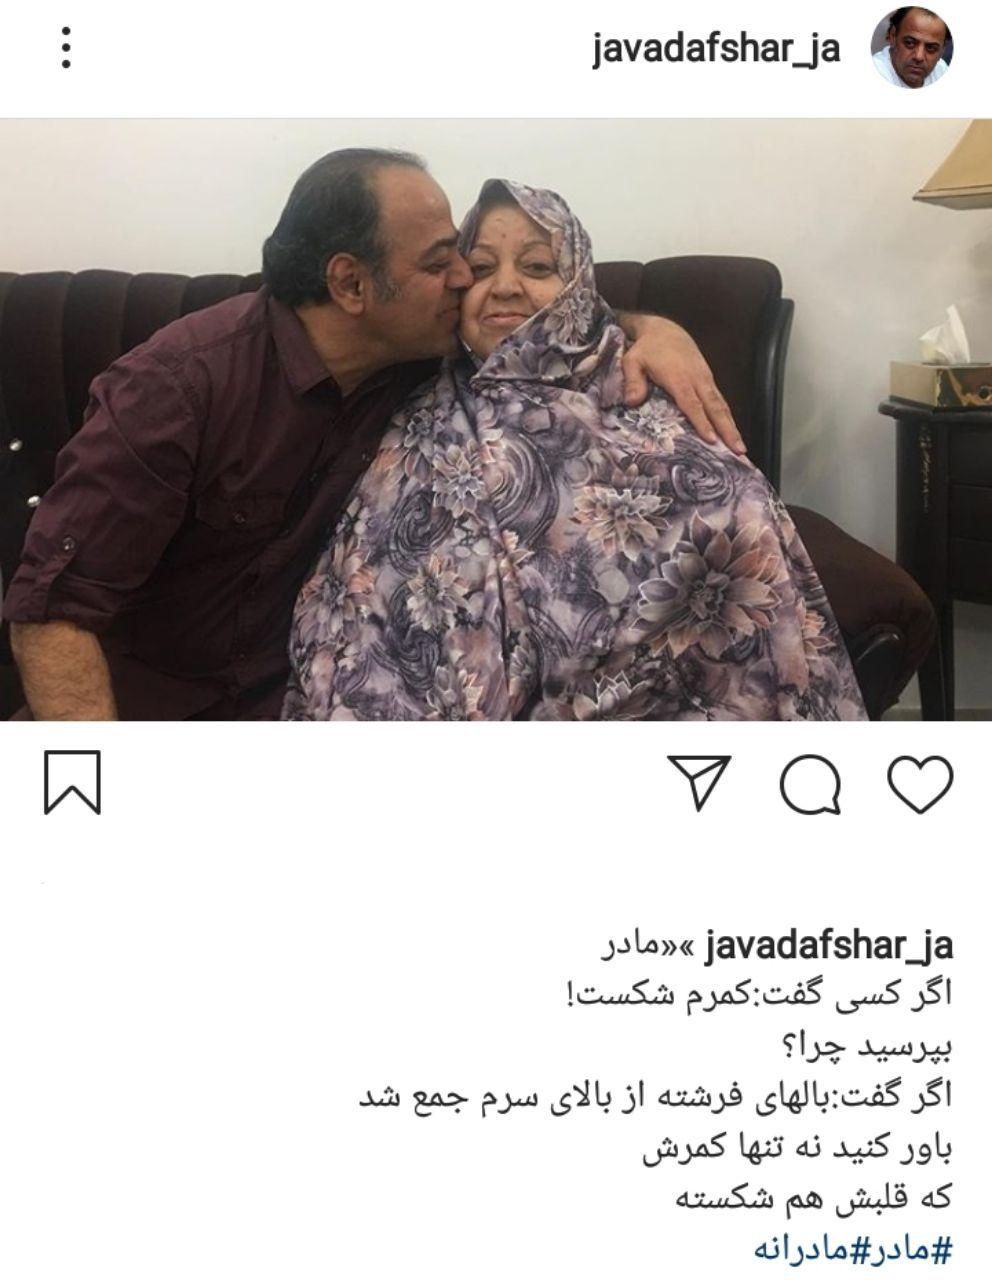 فوت مادر جواد افشار